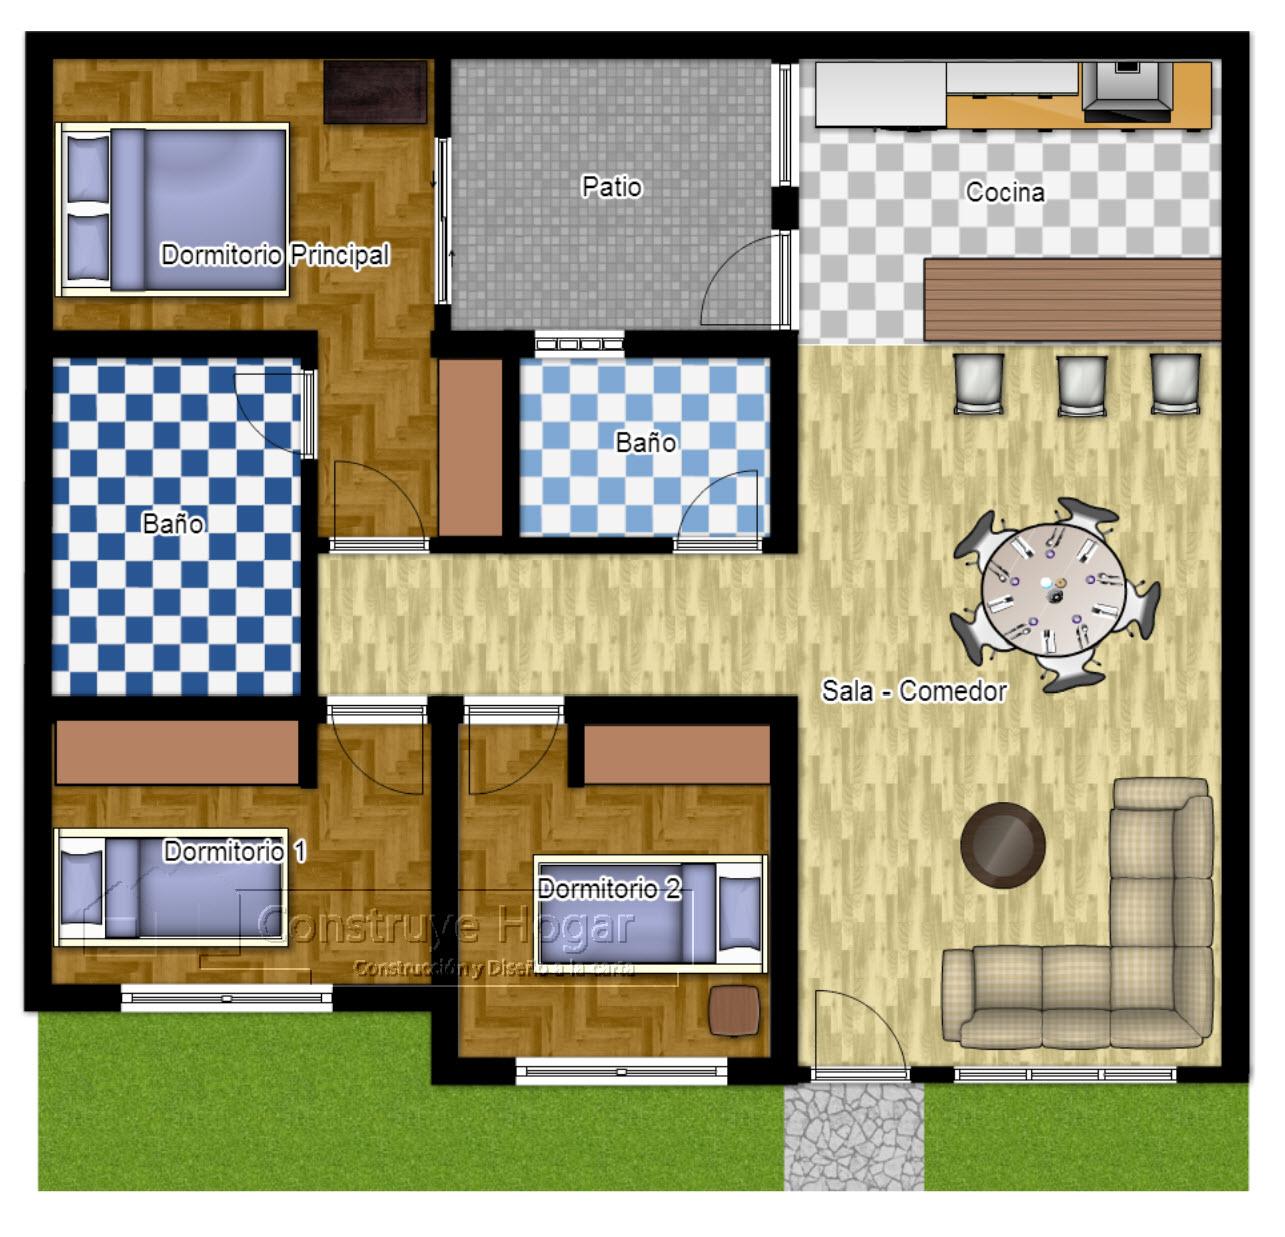 Rumah Minimalis Lantai 1 Kamar 4 Desain Modern Gambar